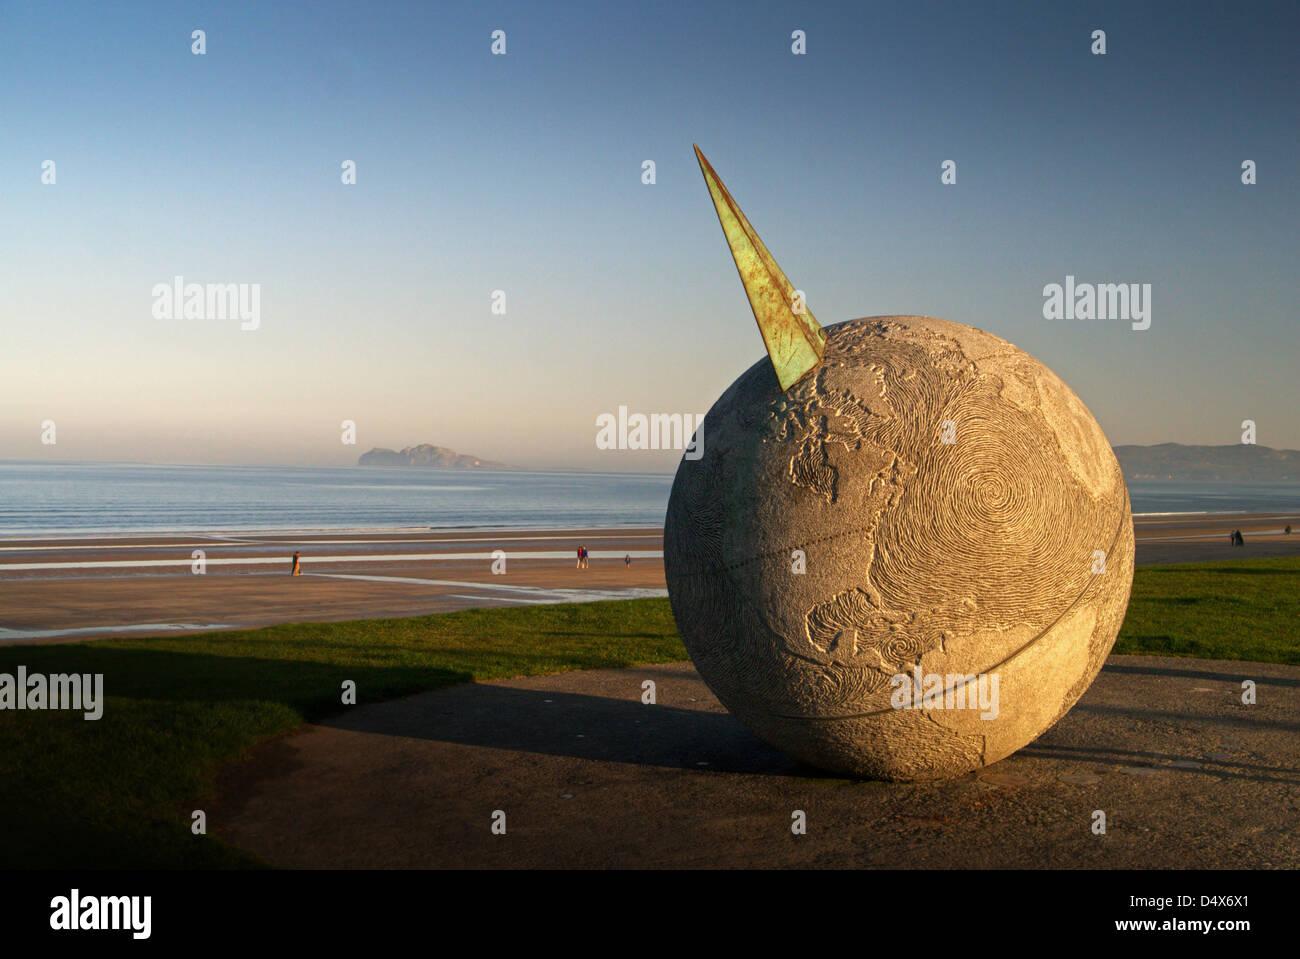 Globe Monument Portmarnock Strand Co. Dublin - Stock Image